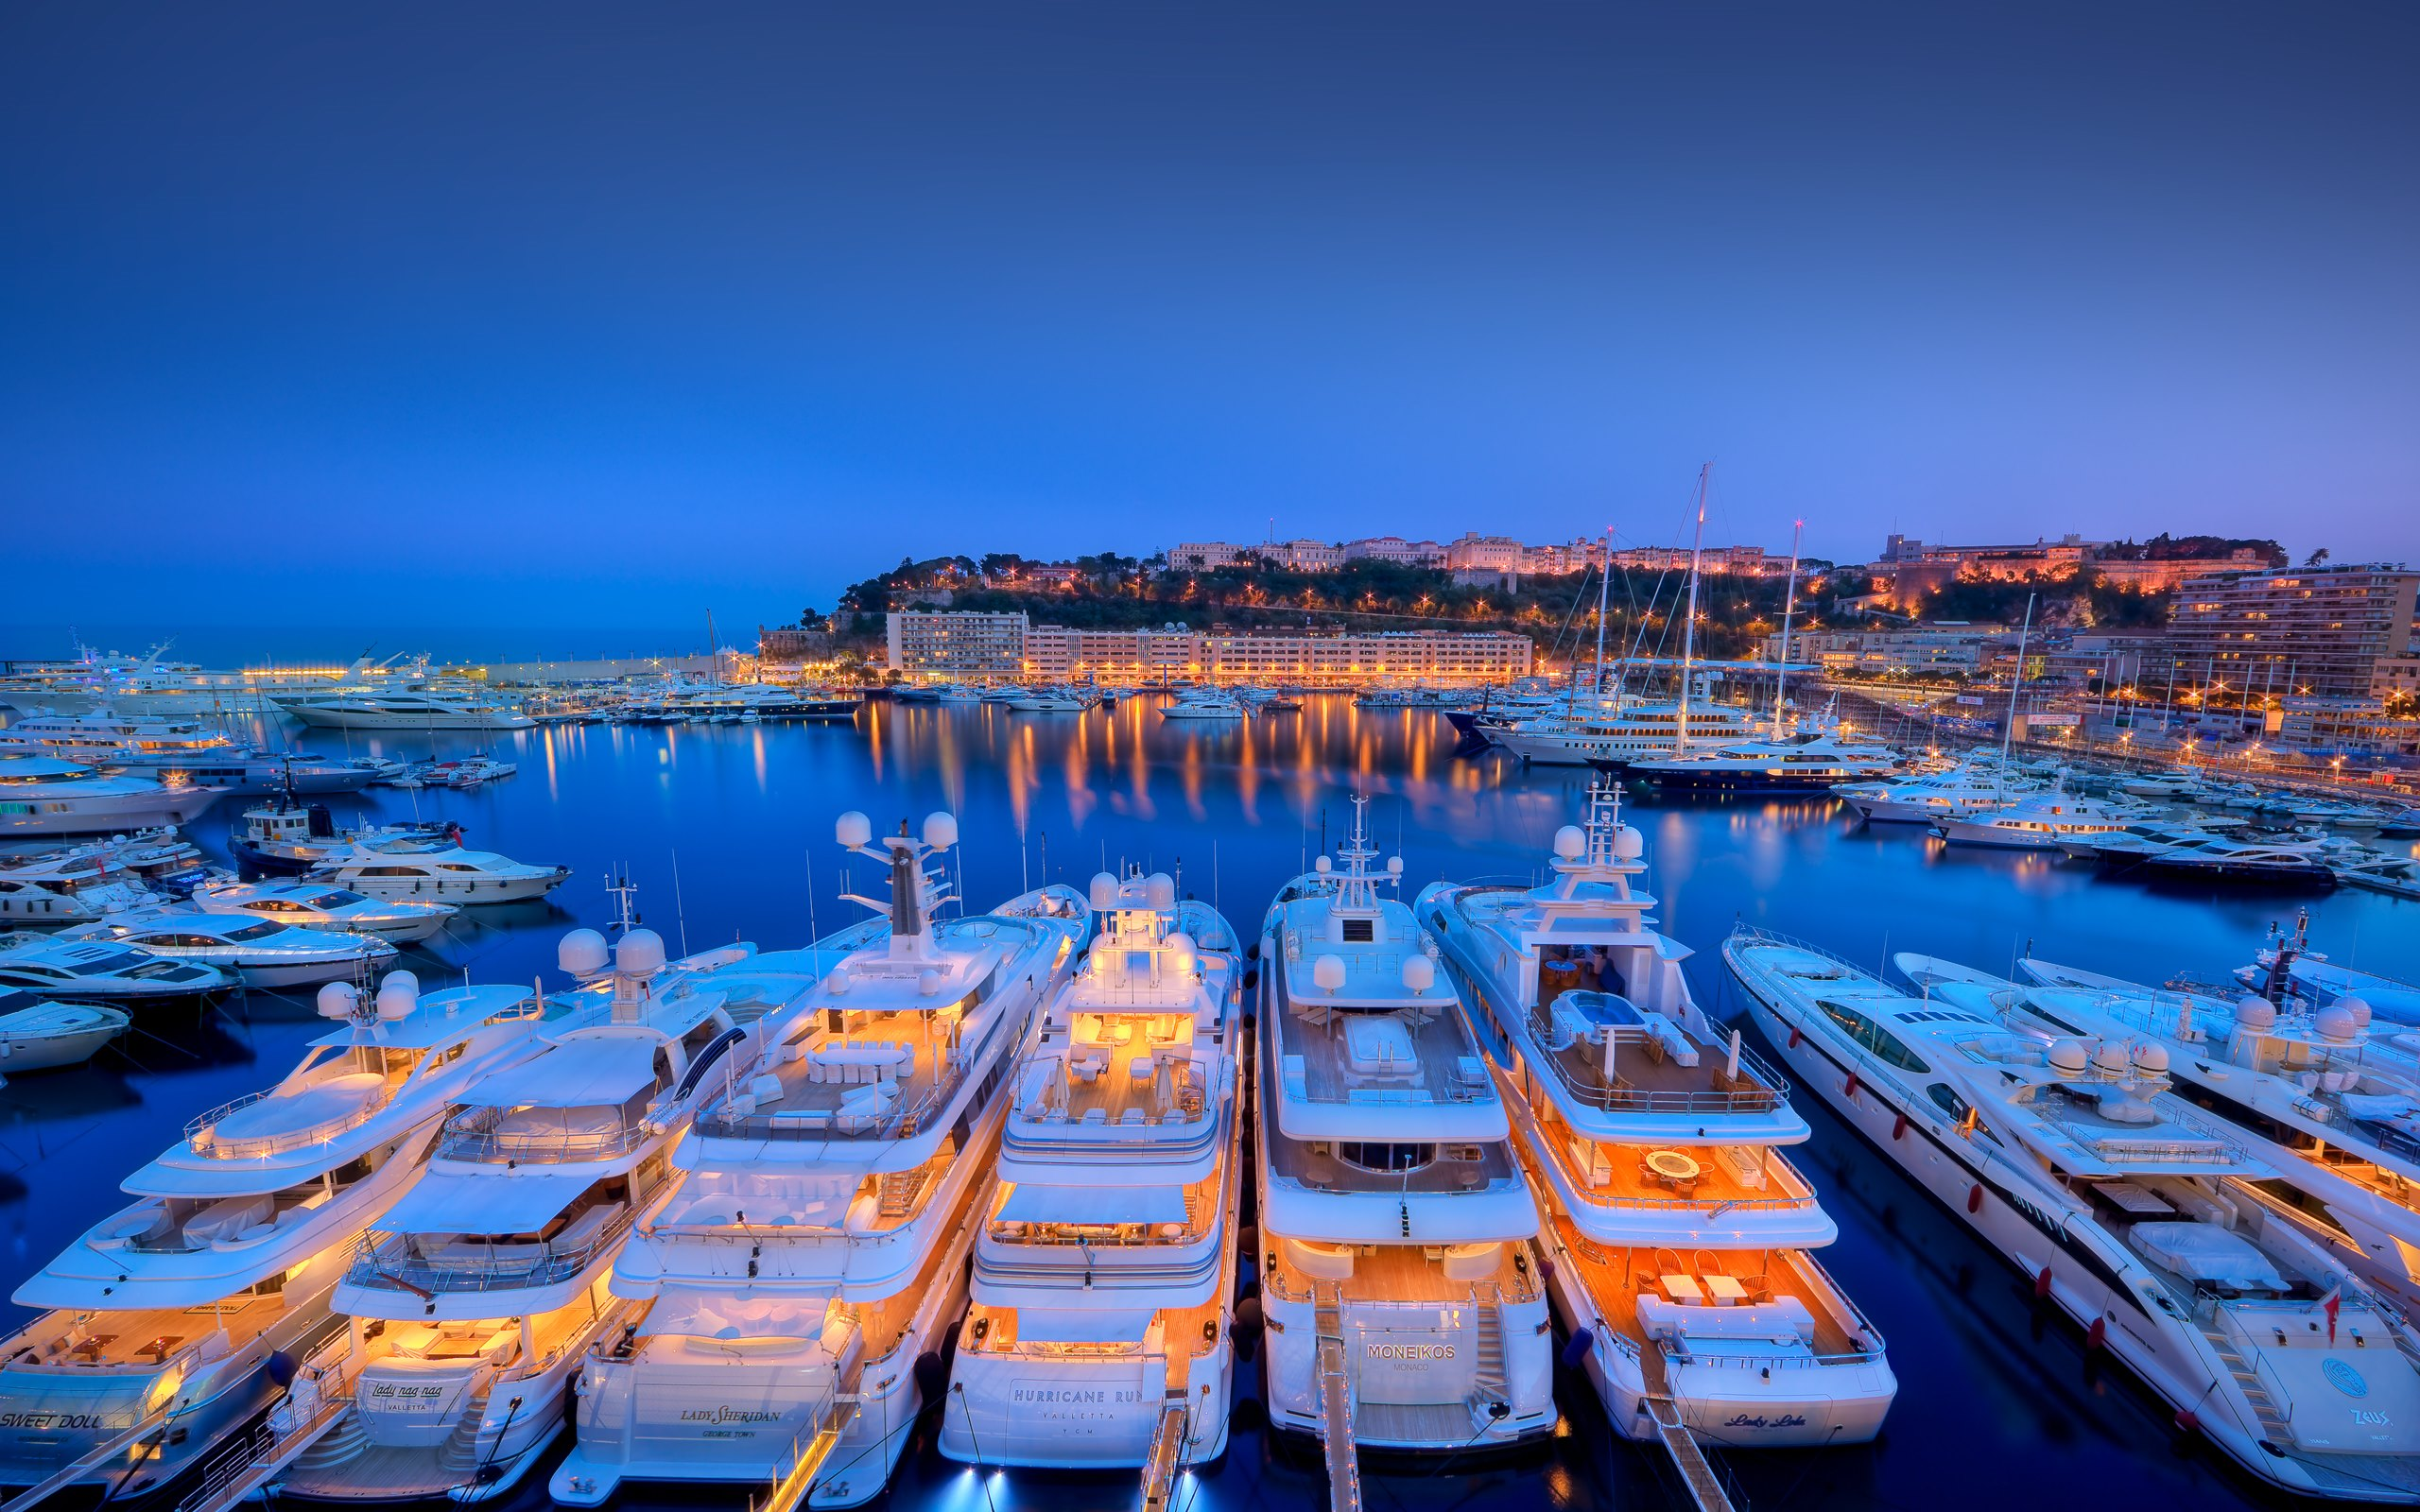 Iphone wallpaper yacht - Wallpaper Yachts In Port Hercule From Monaco